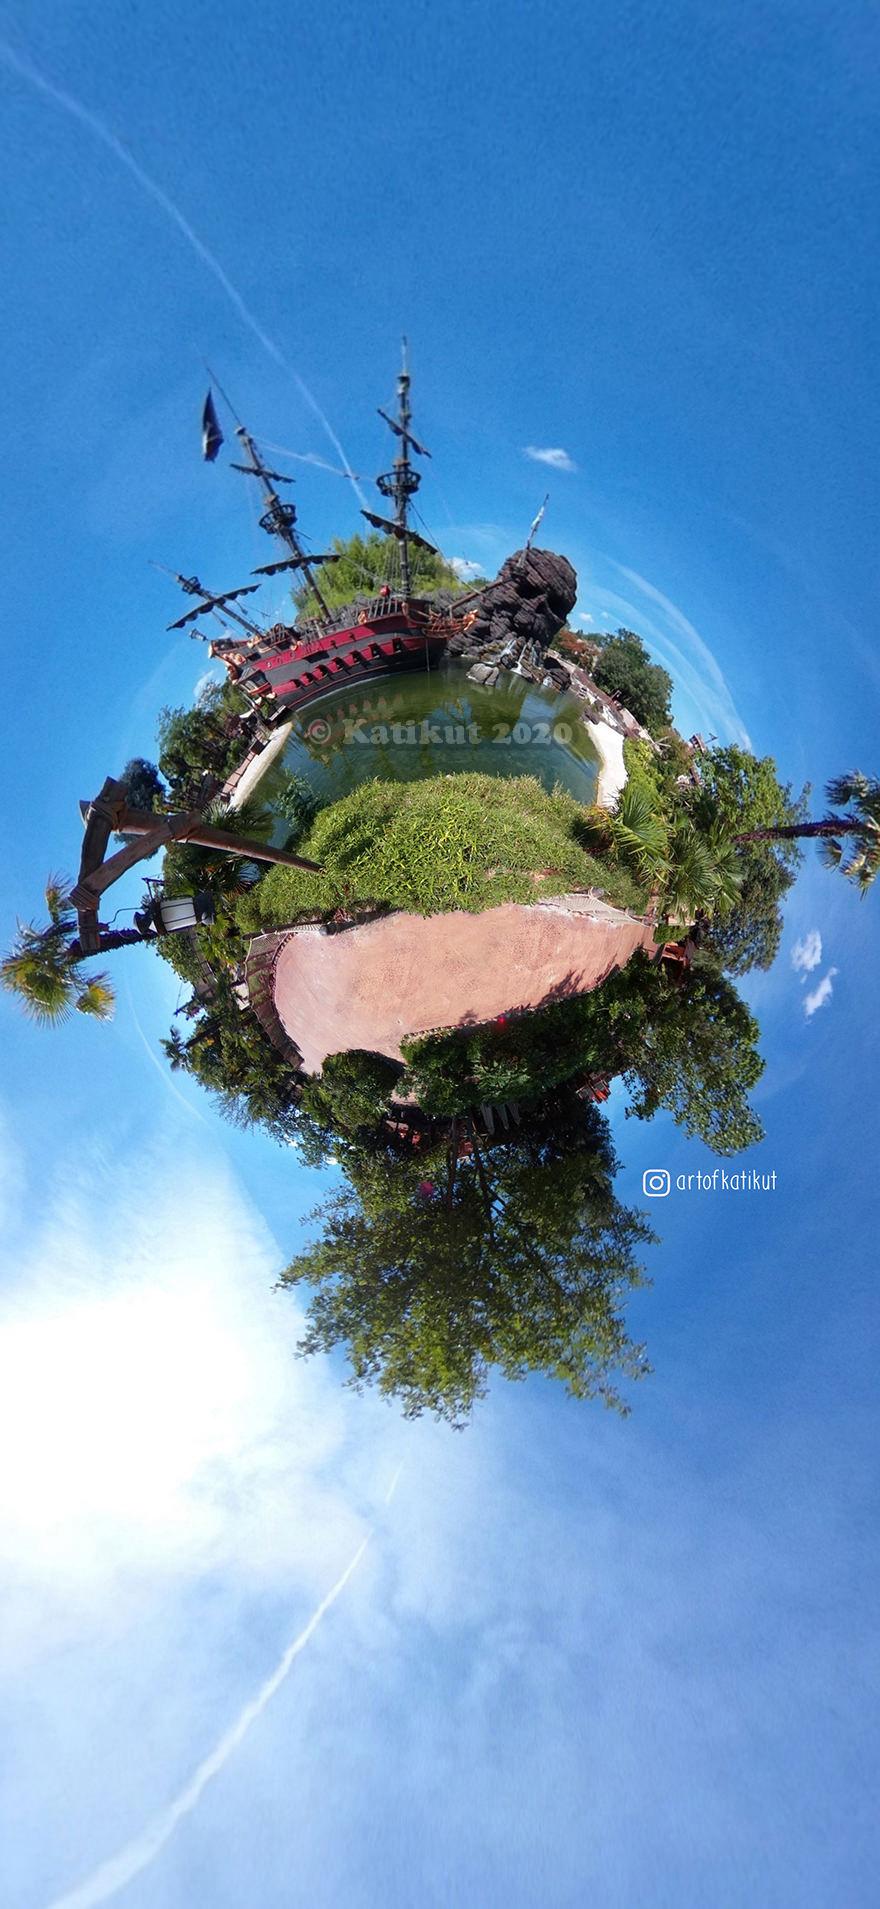 Planete disneyland Paris 360 Fisheye